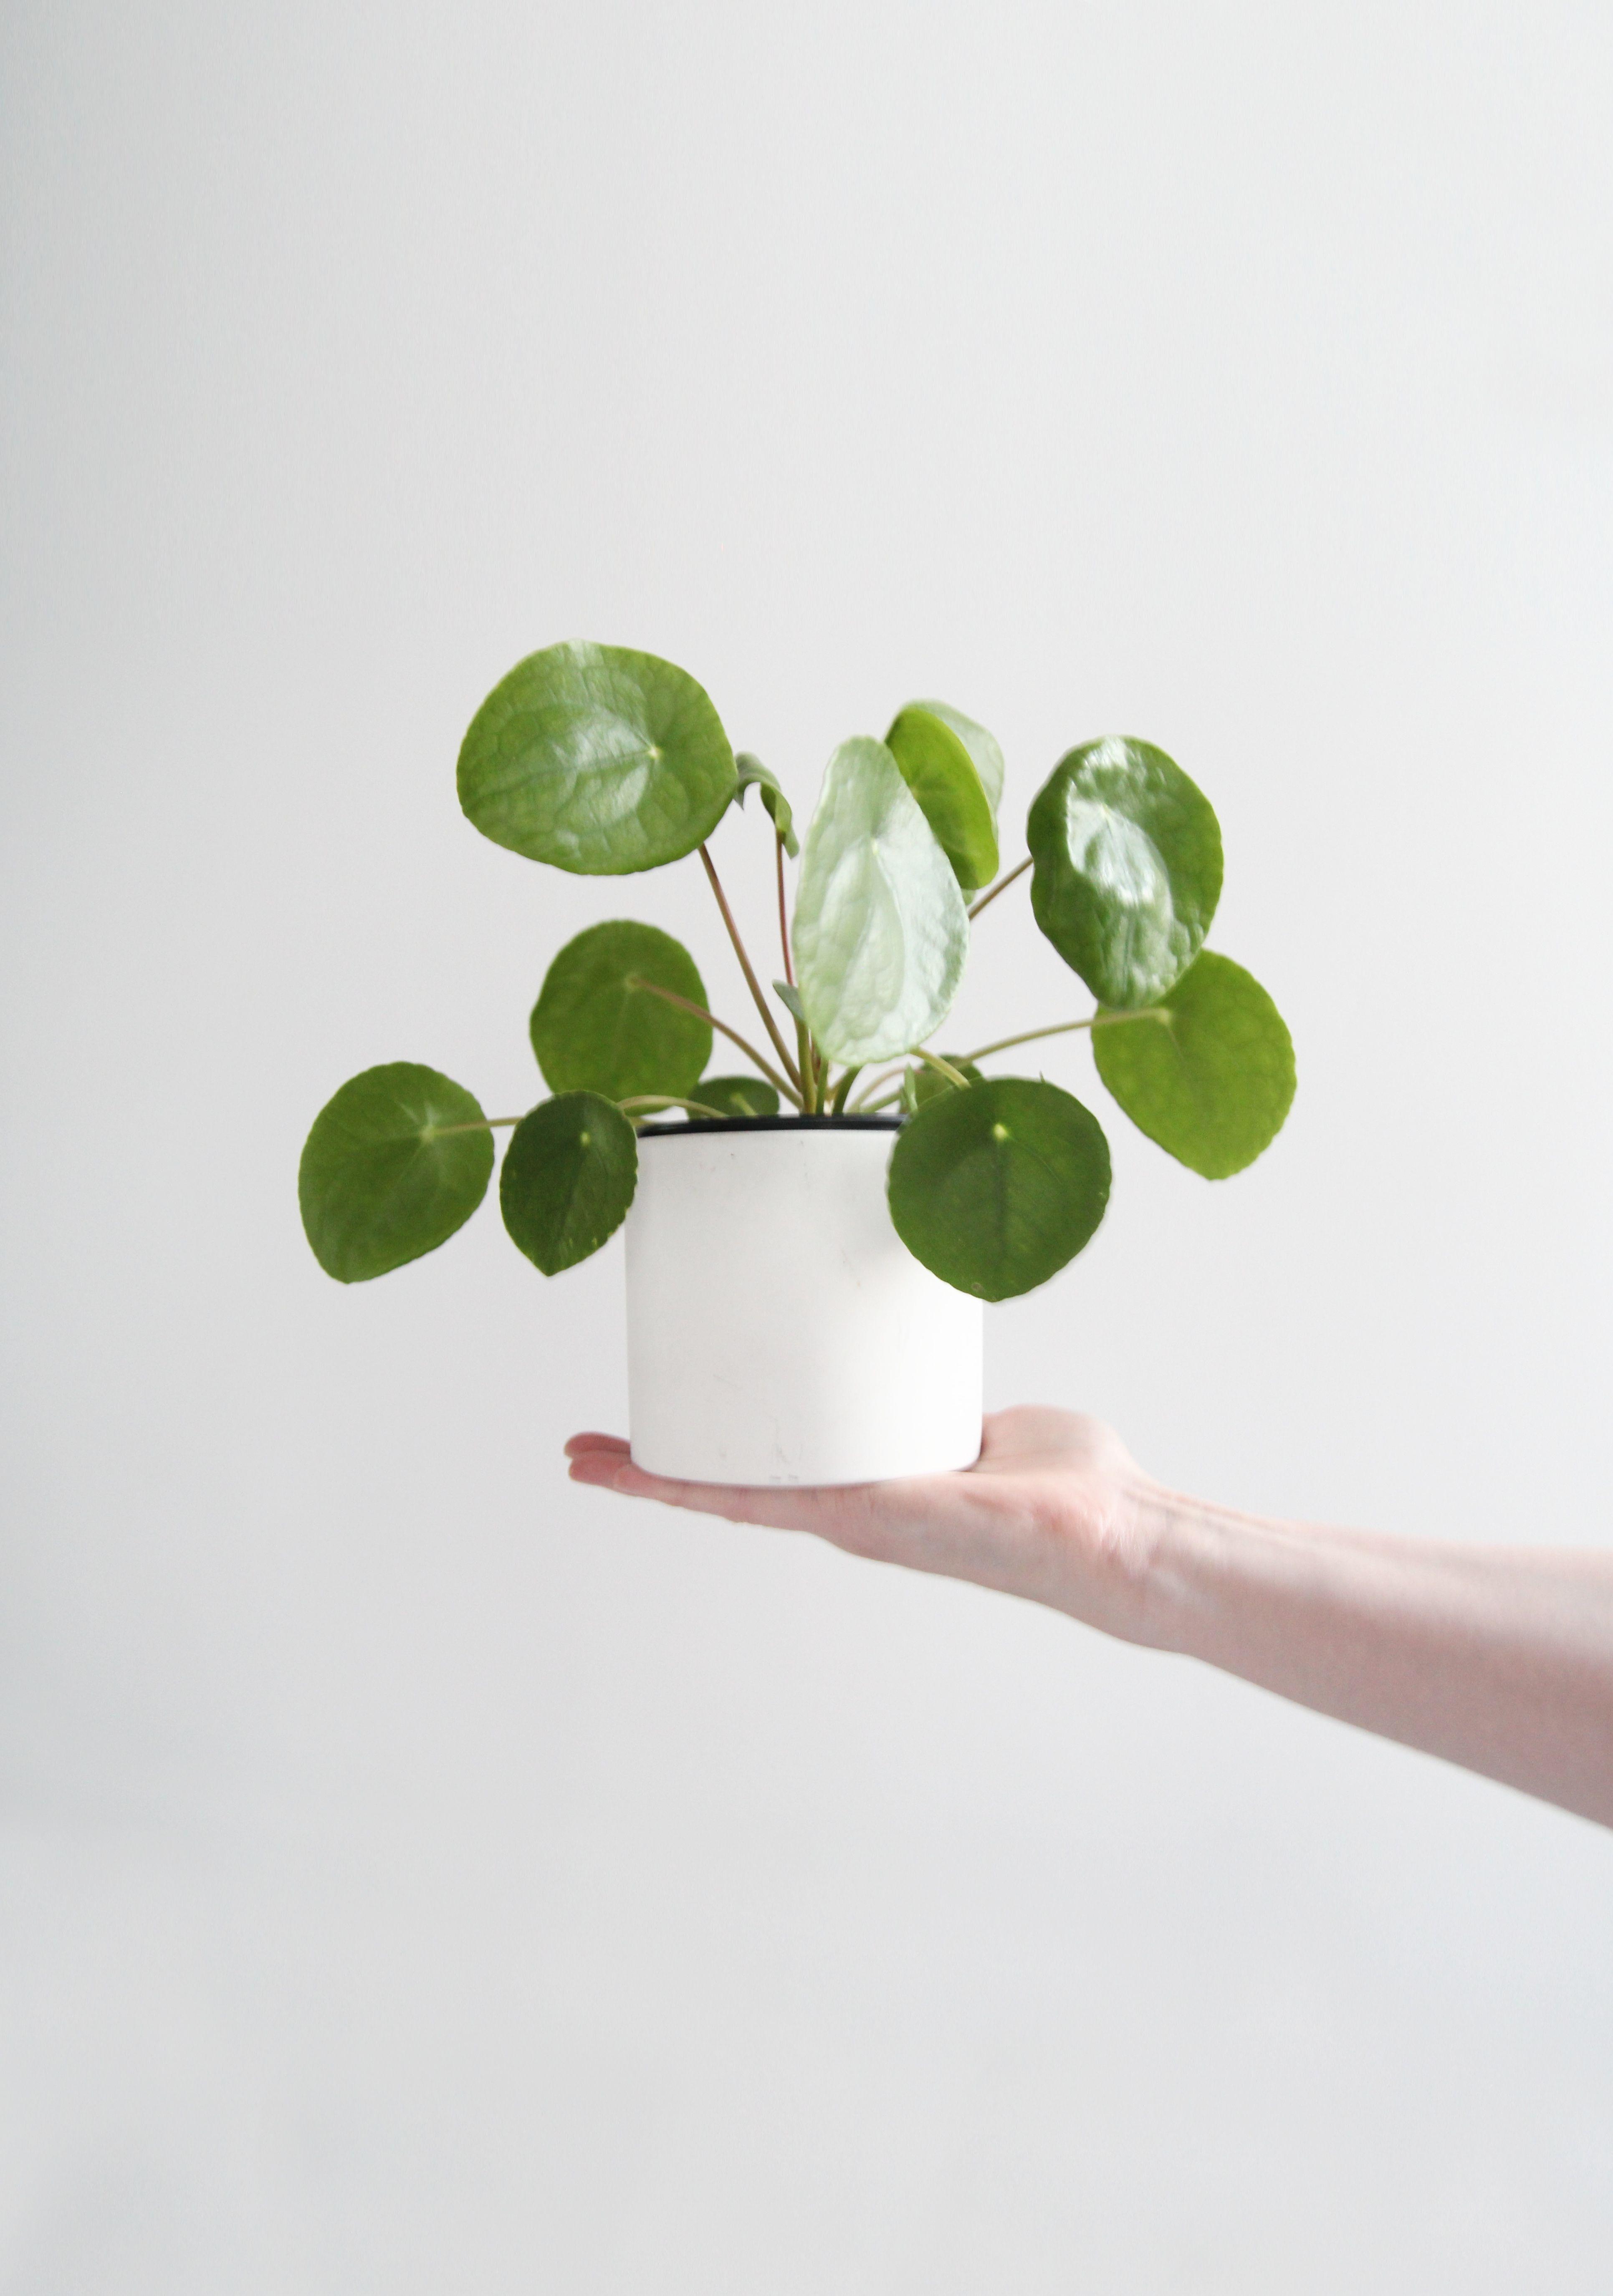 pilea peperomioides garden pinterest plantes jardinage urbain et fleur. Black Bedroom Furniture Sets. Home Design Ideas